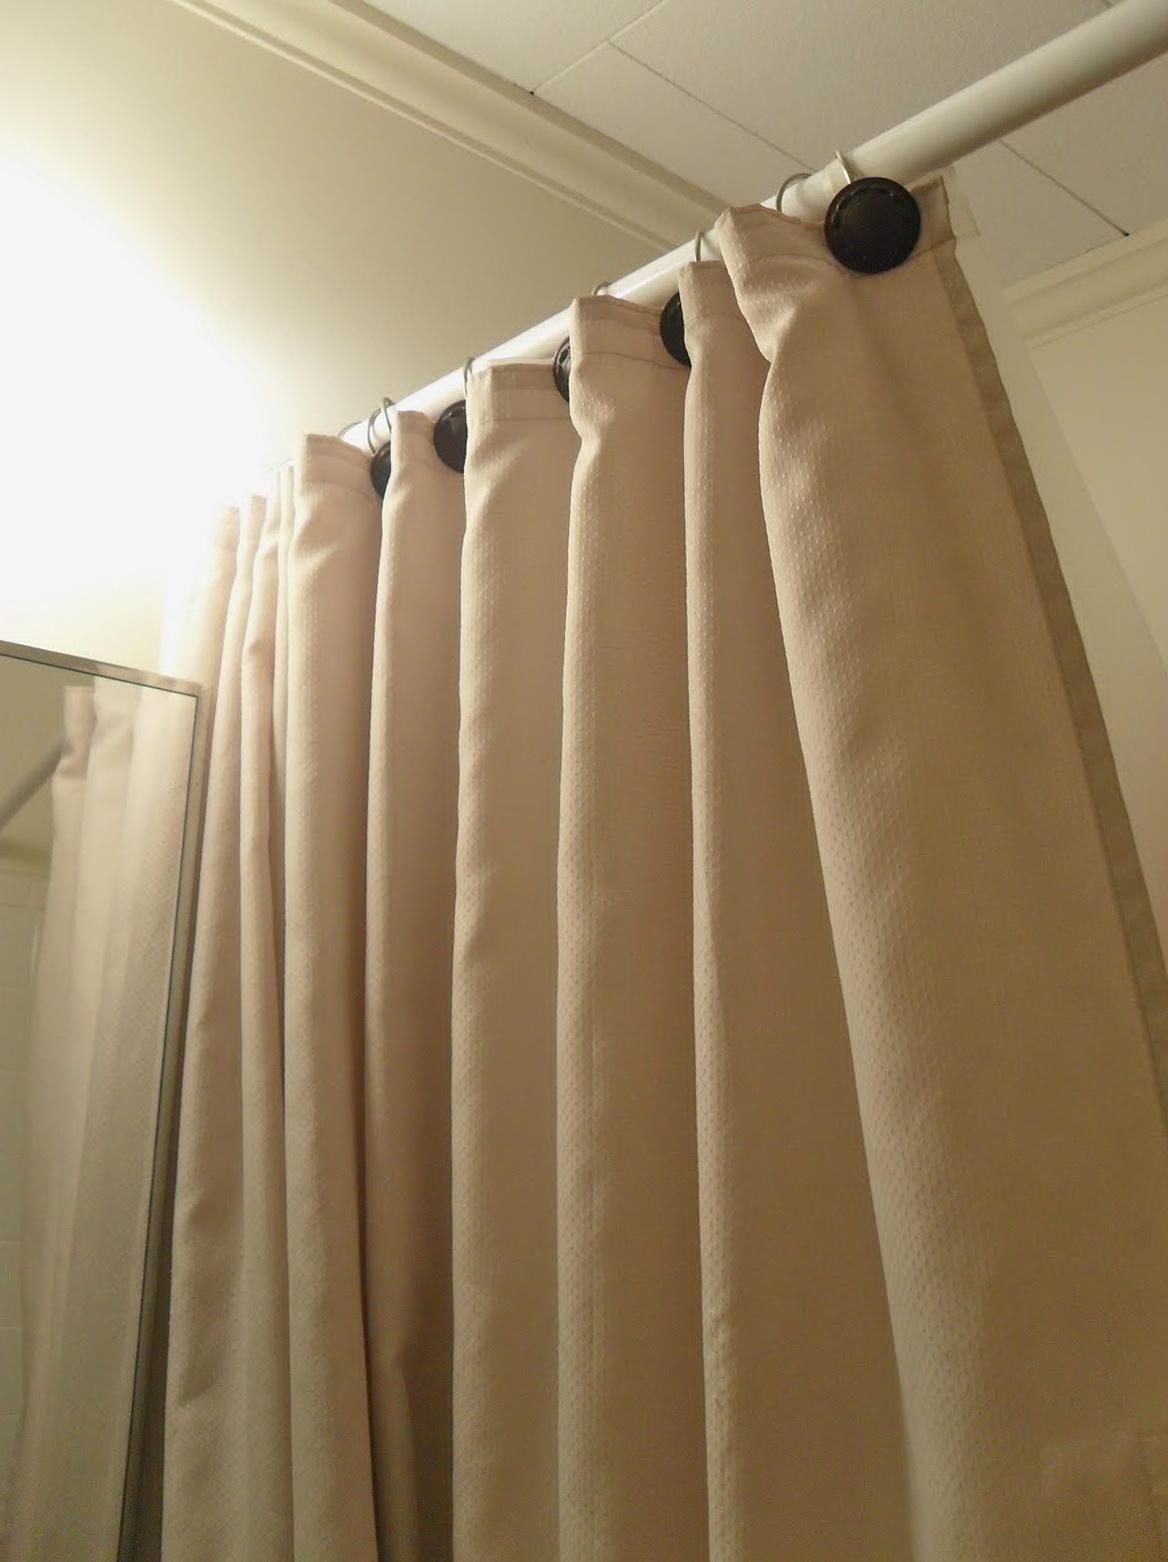 Shower Curtain Tension Rod Target Home Design Ideas